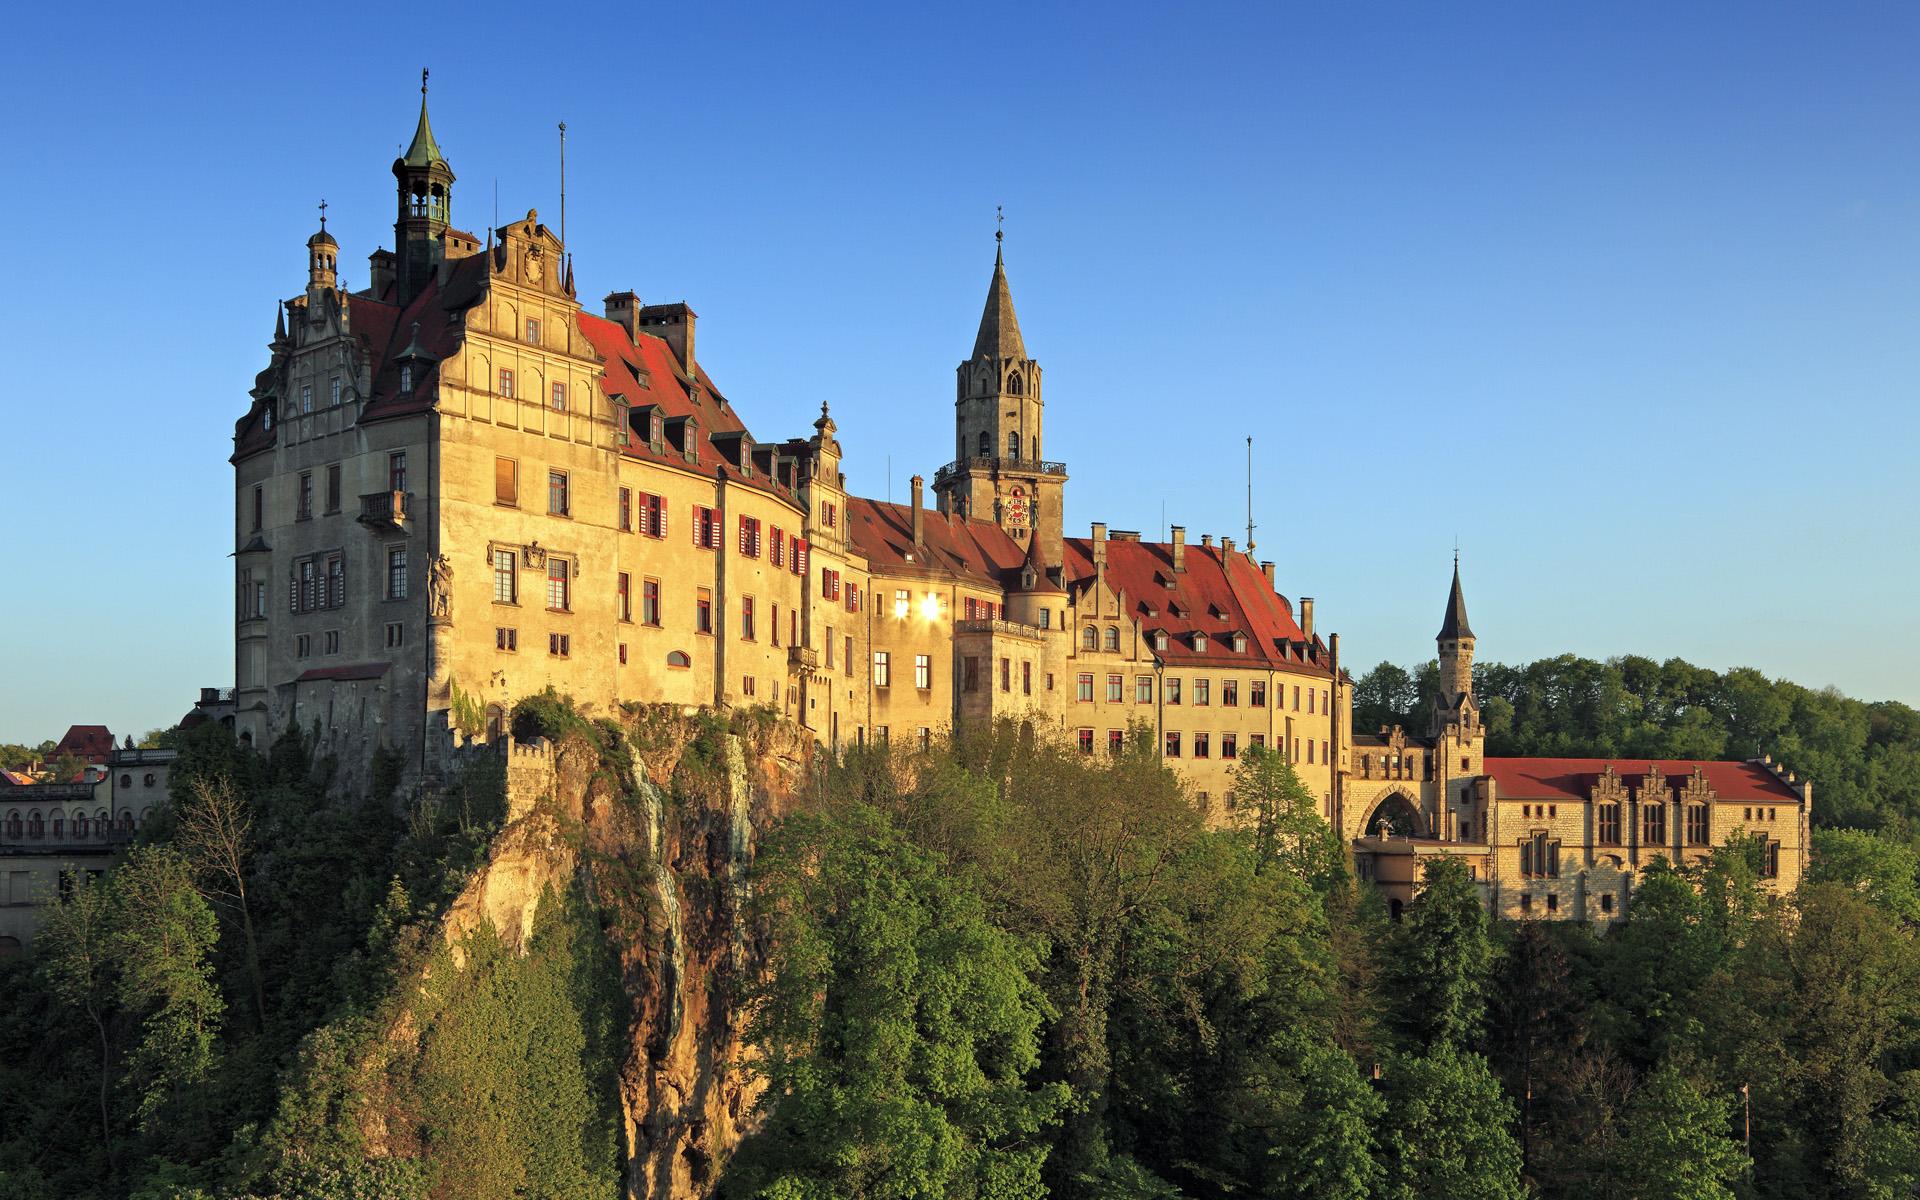 German Castles Wallpaper castles of europe windows 7 theme 1920x1200